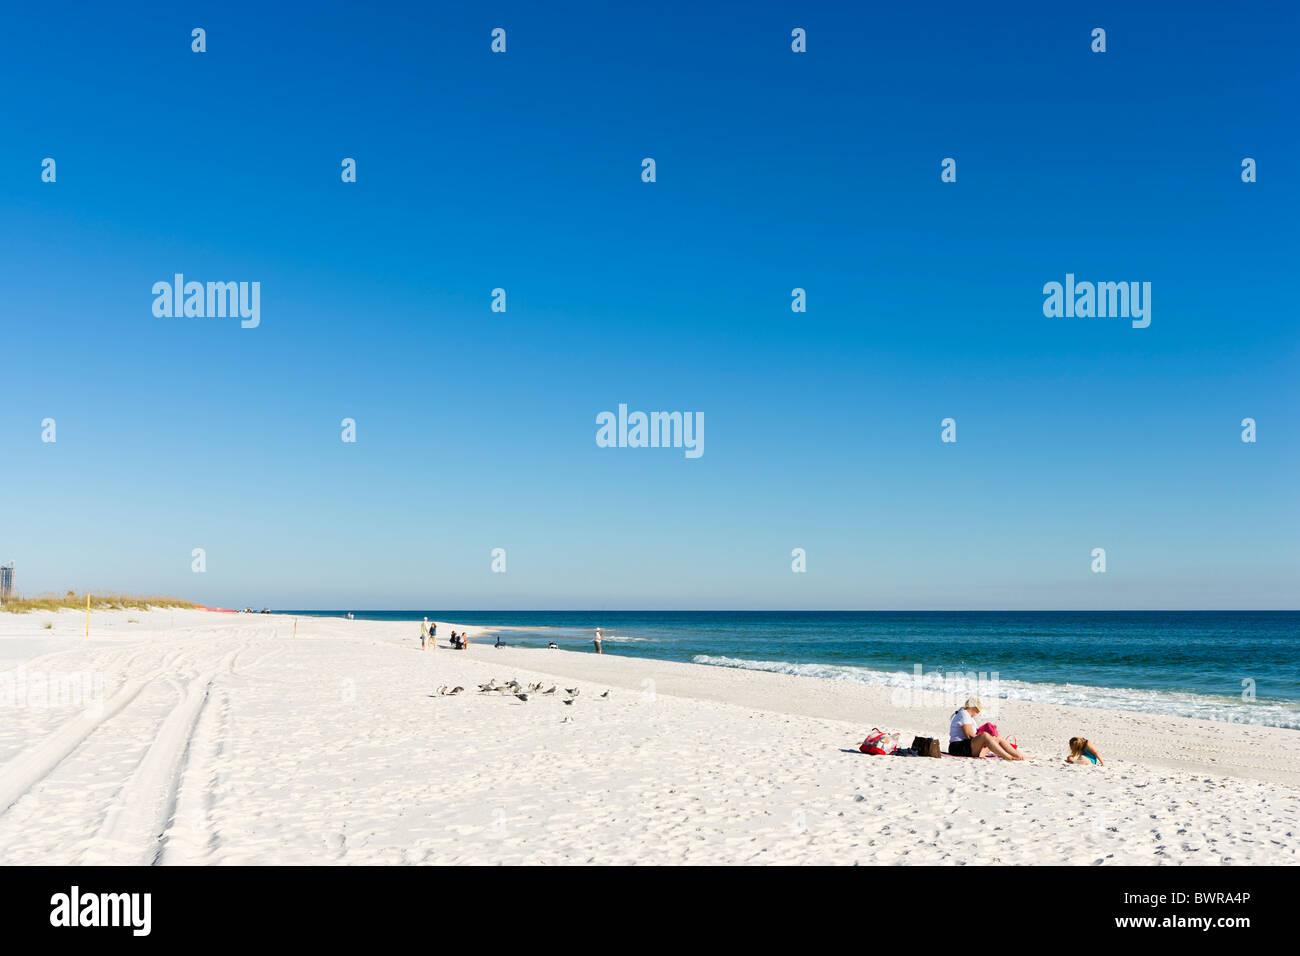 Beach at Gulf State Park, Gulf Shores, Gulf Coast, Alabama, USA Stock Photo